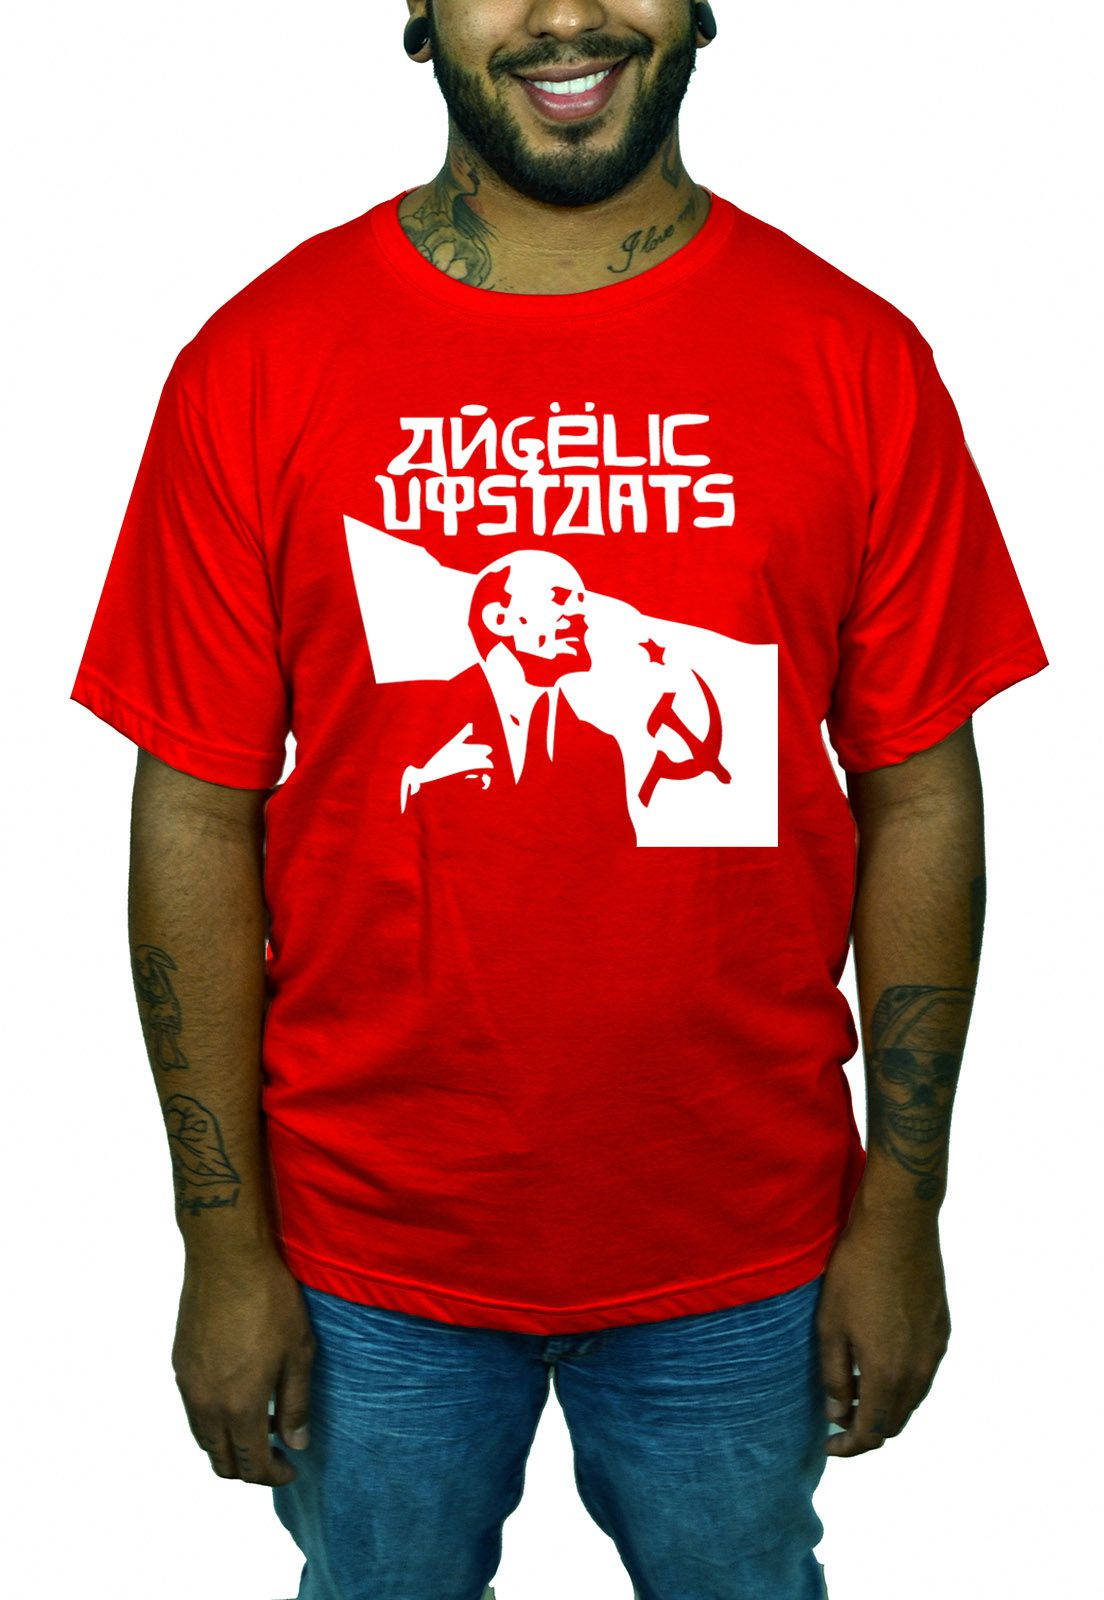 Camiseta Angelic Upstarts - Vermelha  - HShop